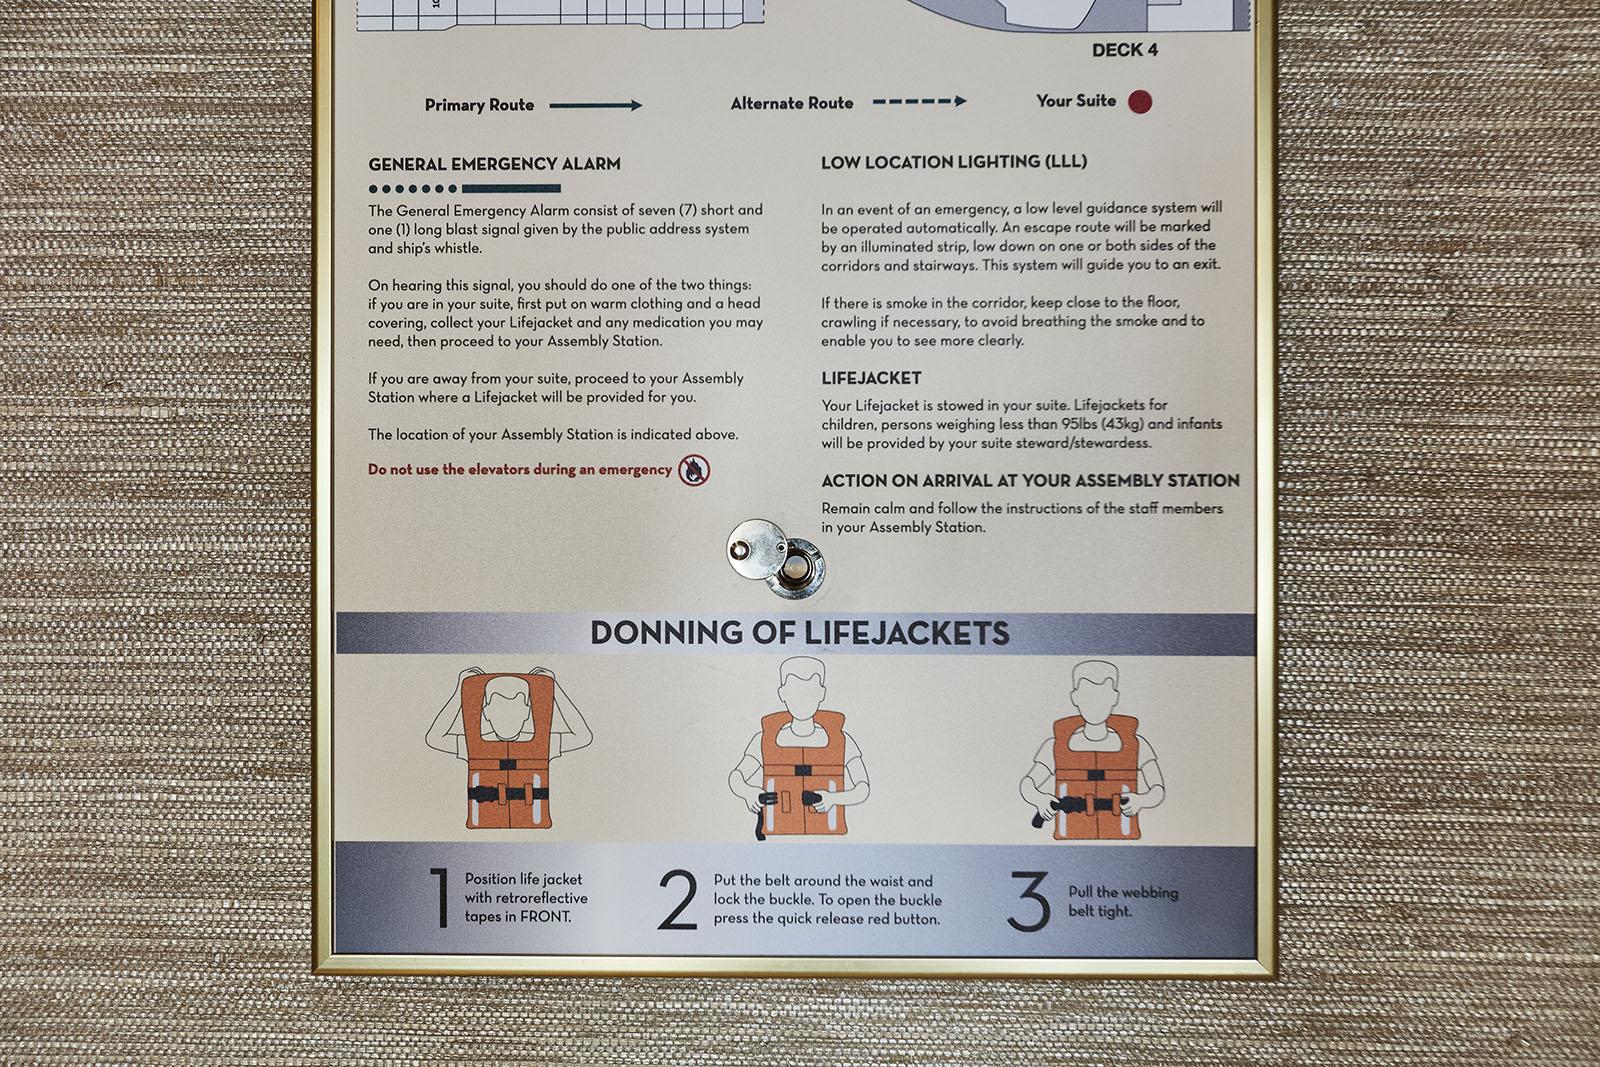 cc-marine-health-safety-13